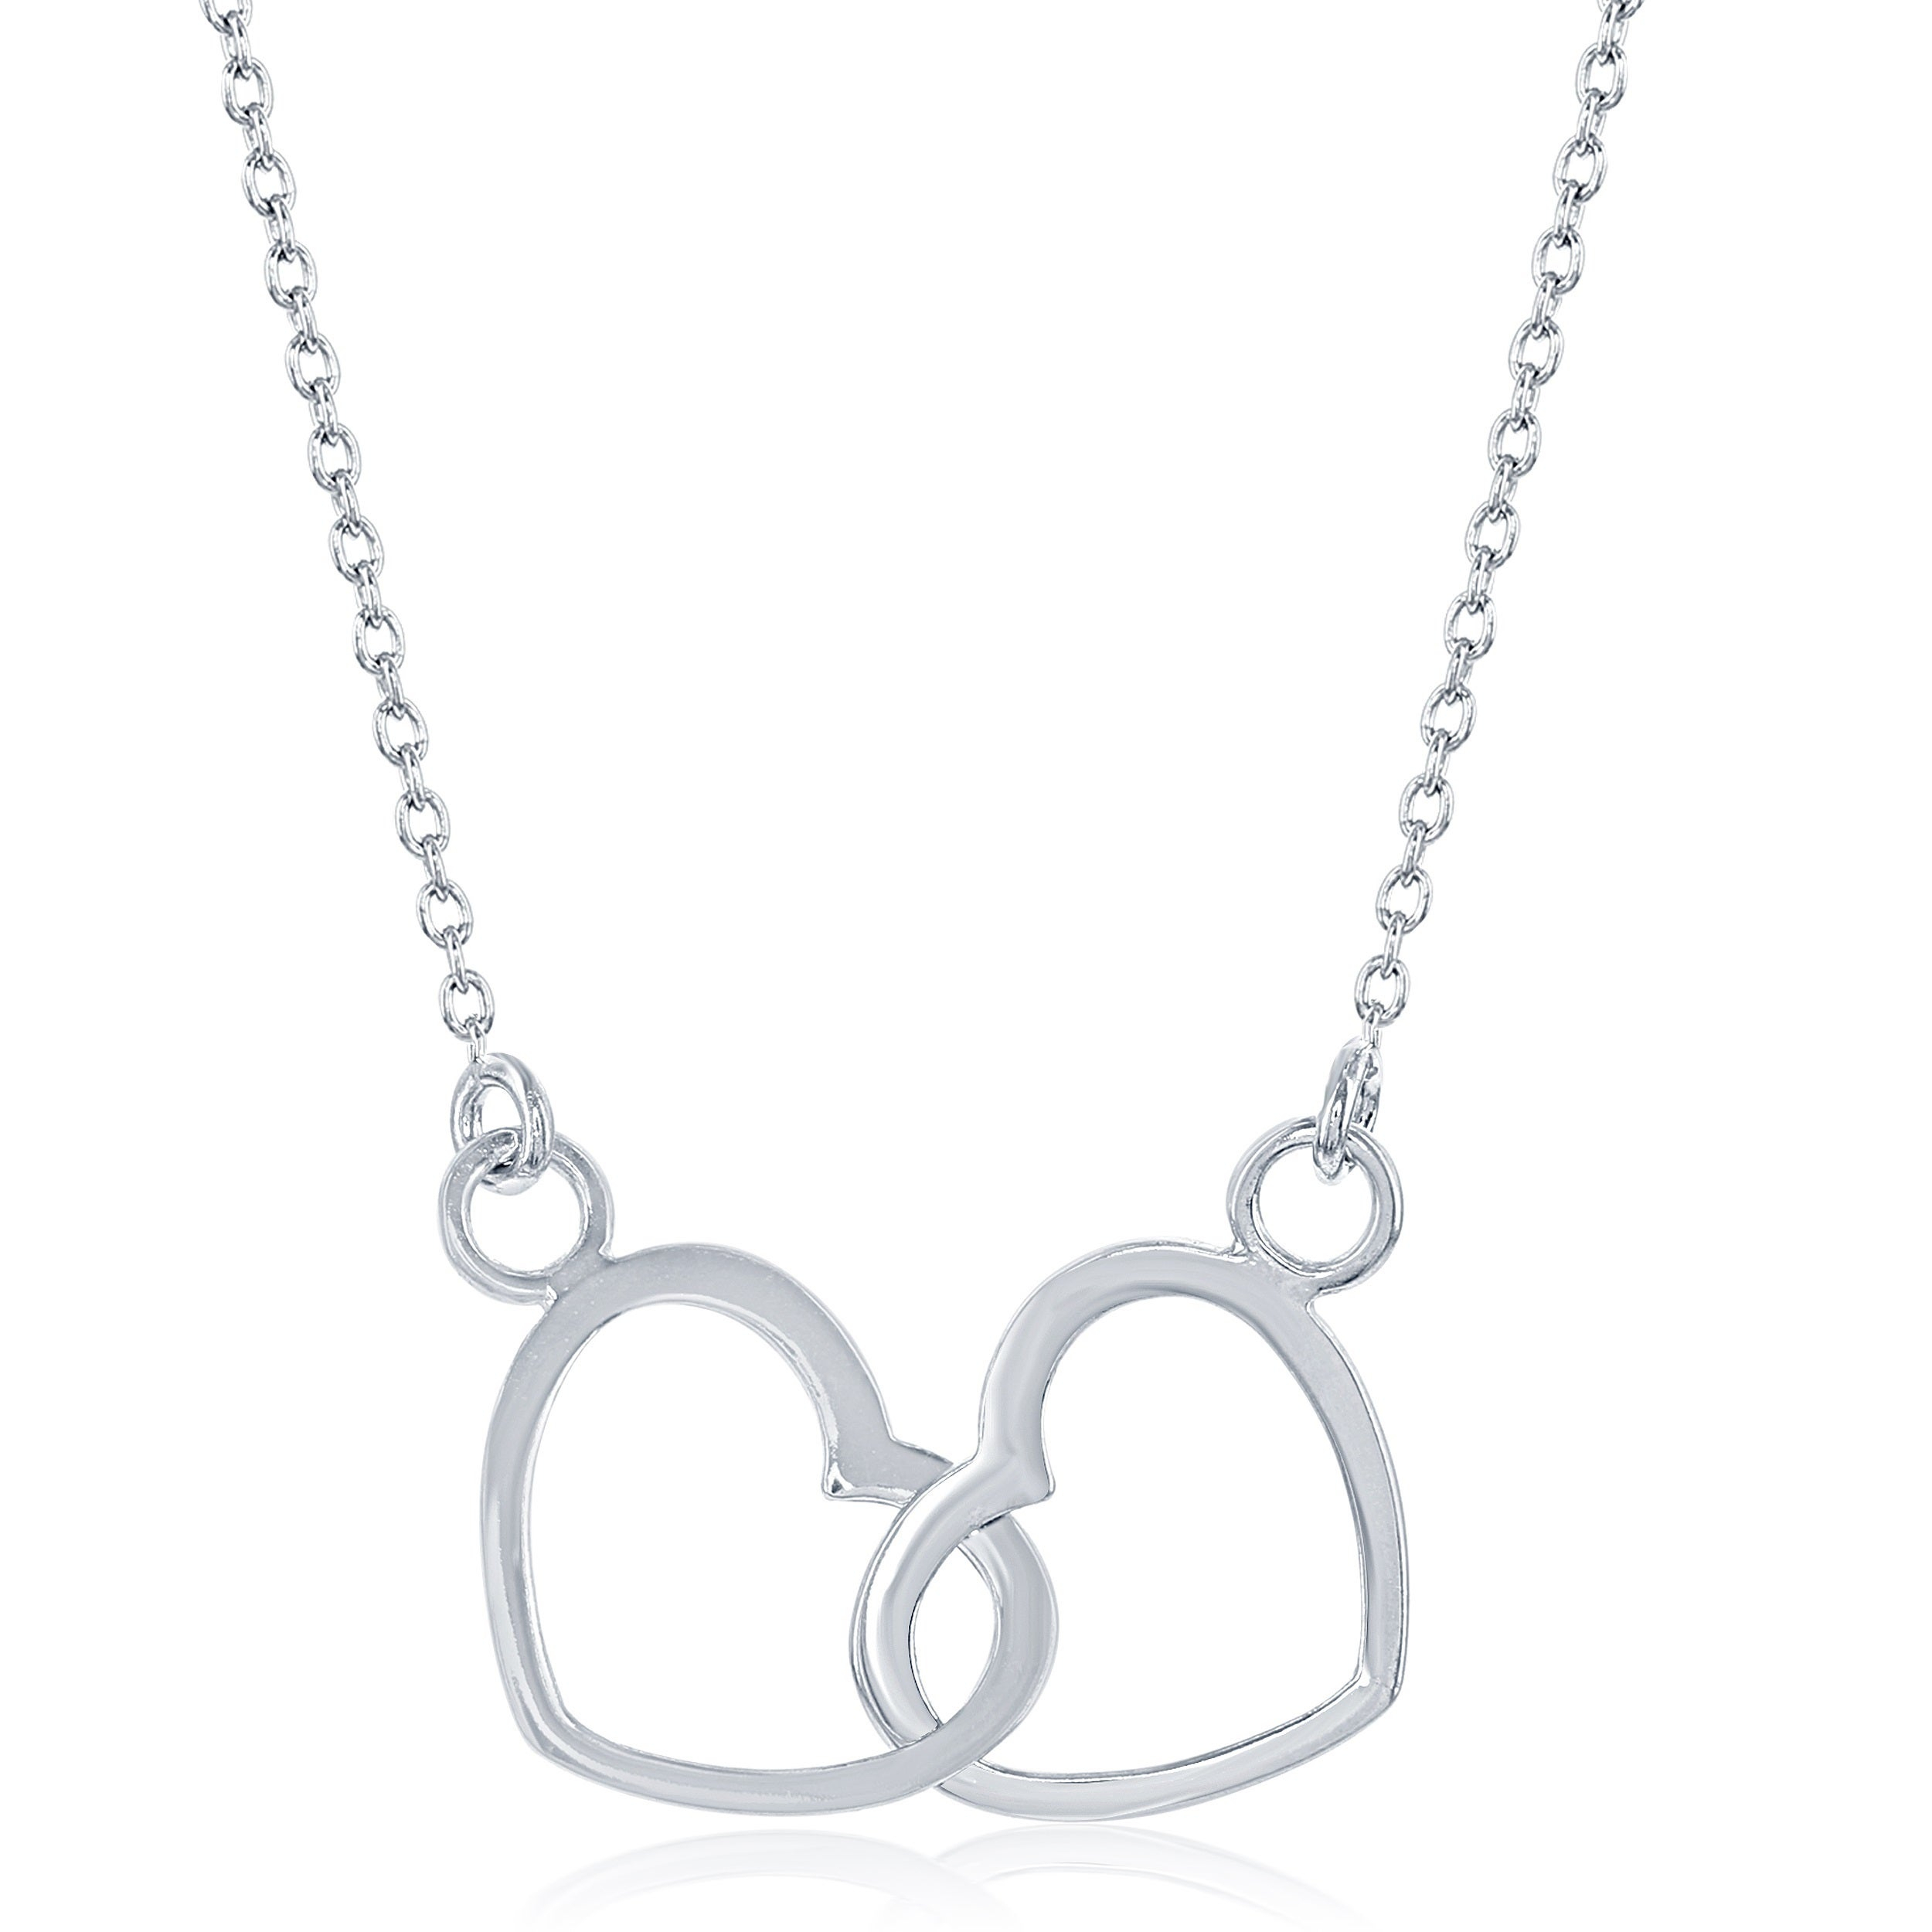 La Preciosa Sterling Silver Lightweight Interlocking Hearts Necklace Pertaining To Most Popular Interlocked Hearts Locket Element Necklaces (View 11 of 25)